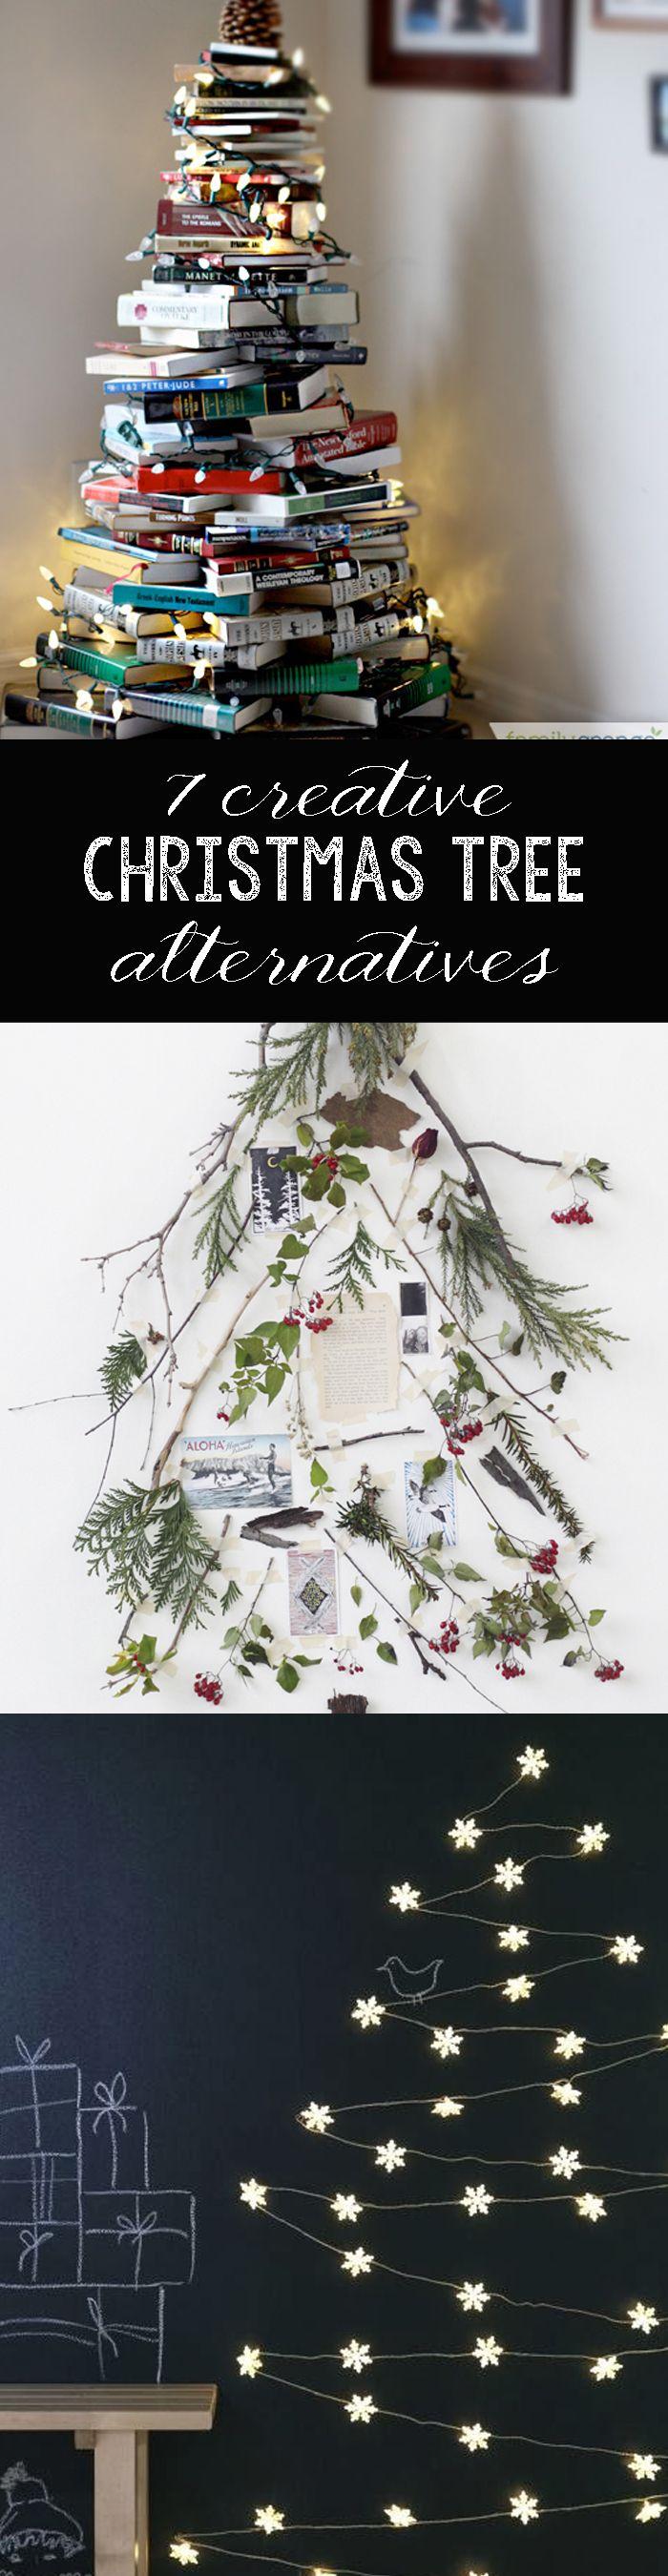 Unique Christmas Trees The 25 Best Unique Christmas Trees Ideas On Pinterest